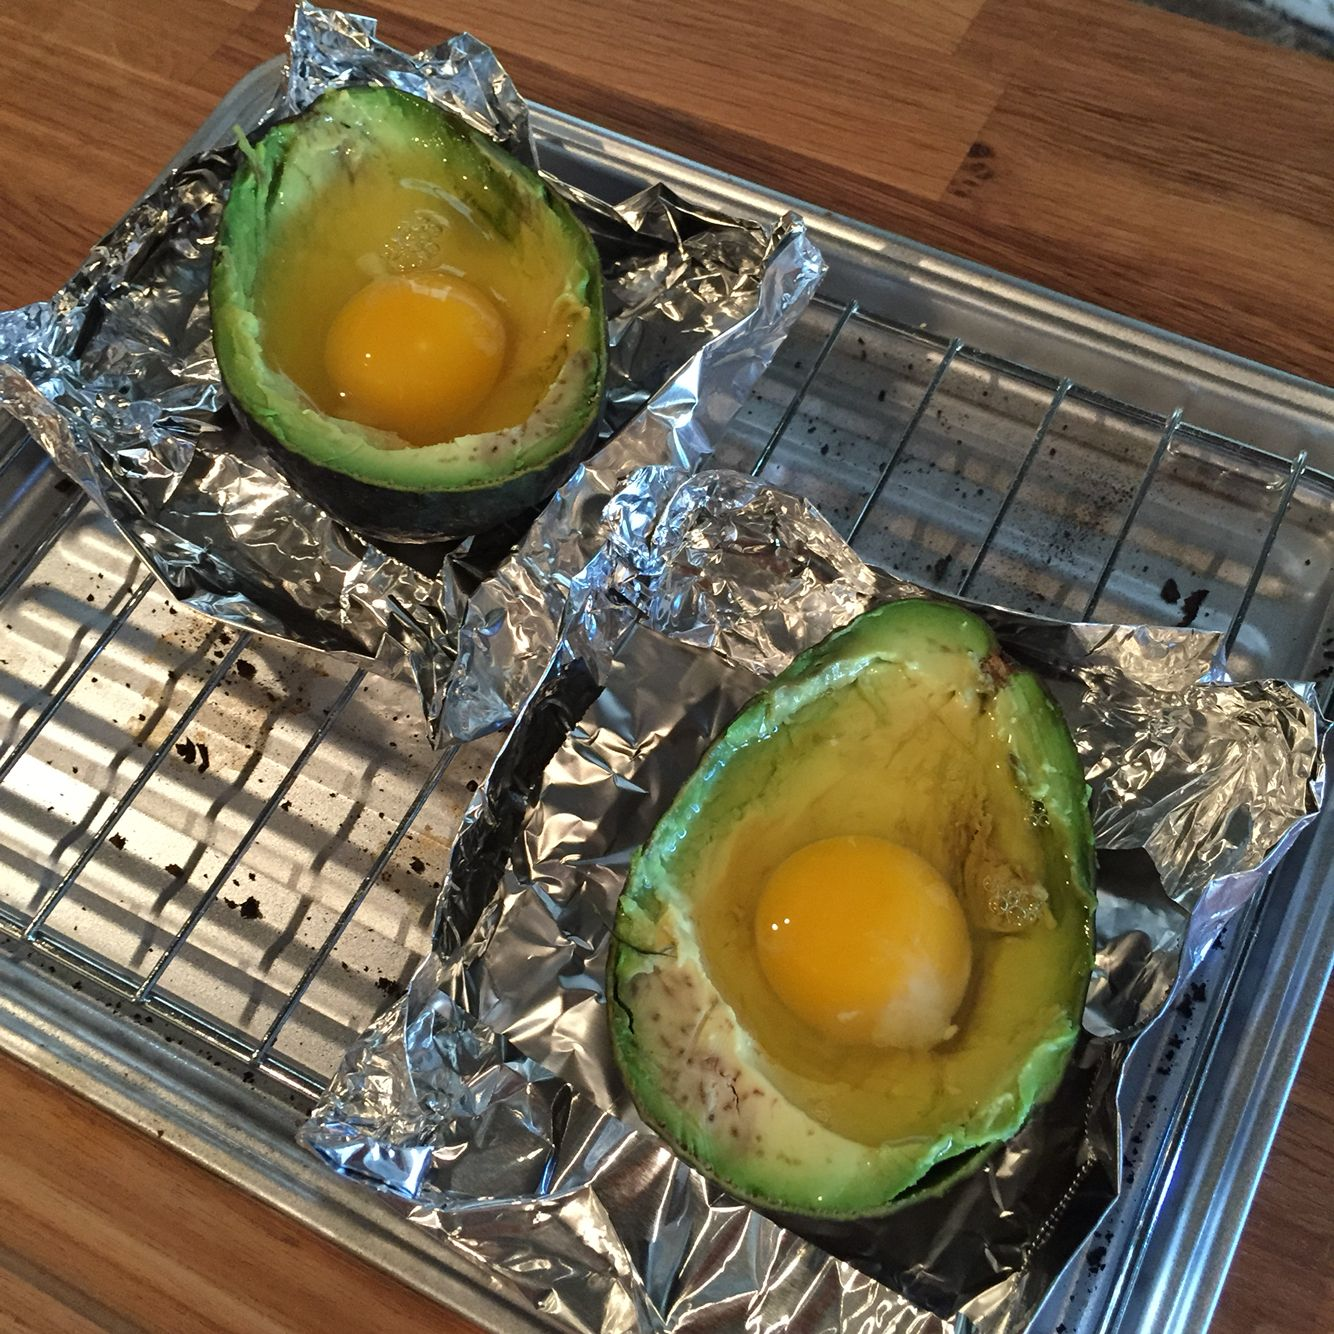 Baked Avocado in process